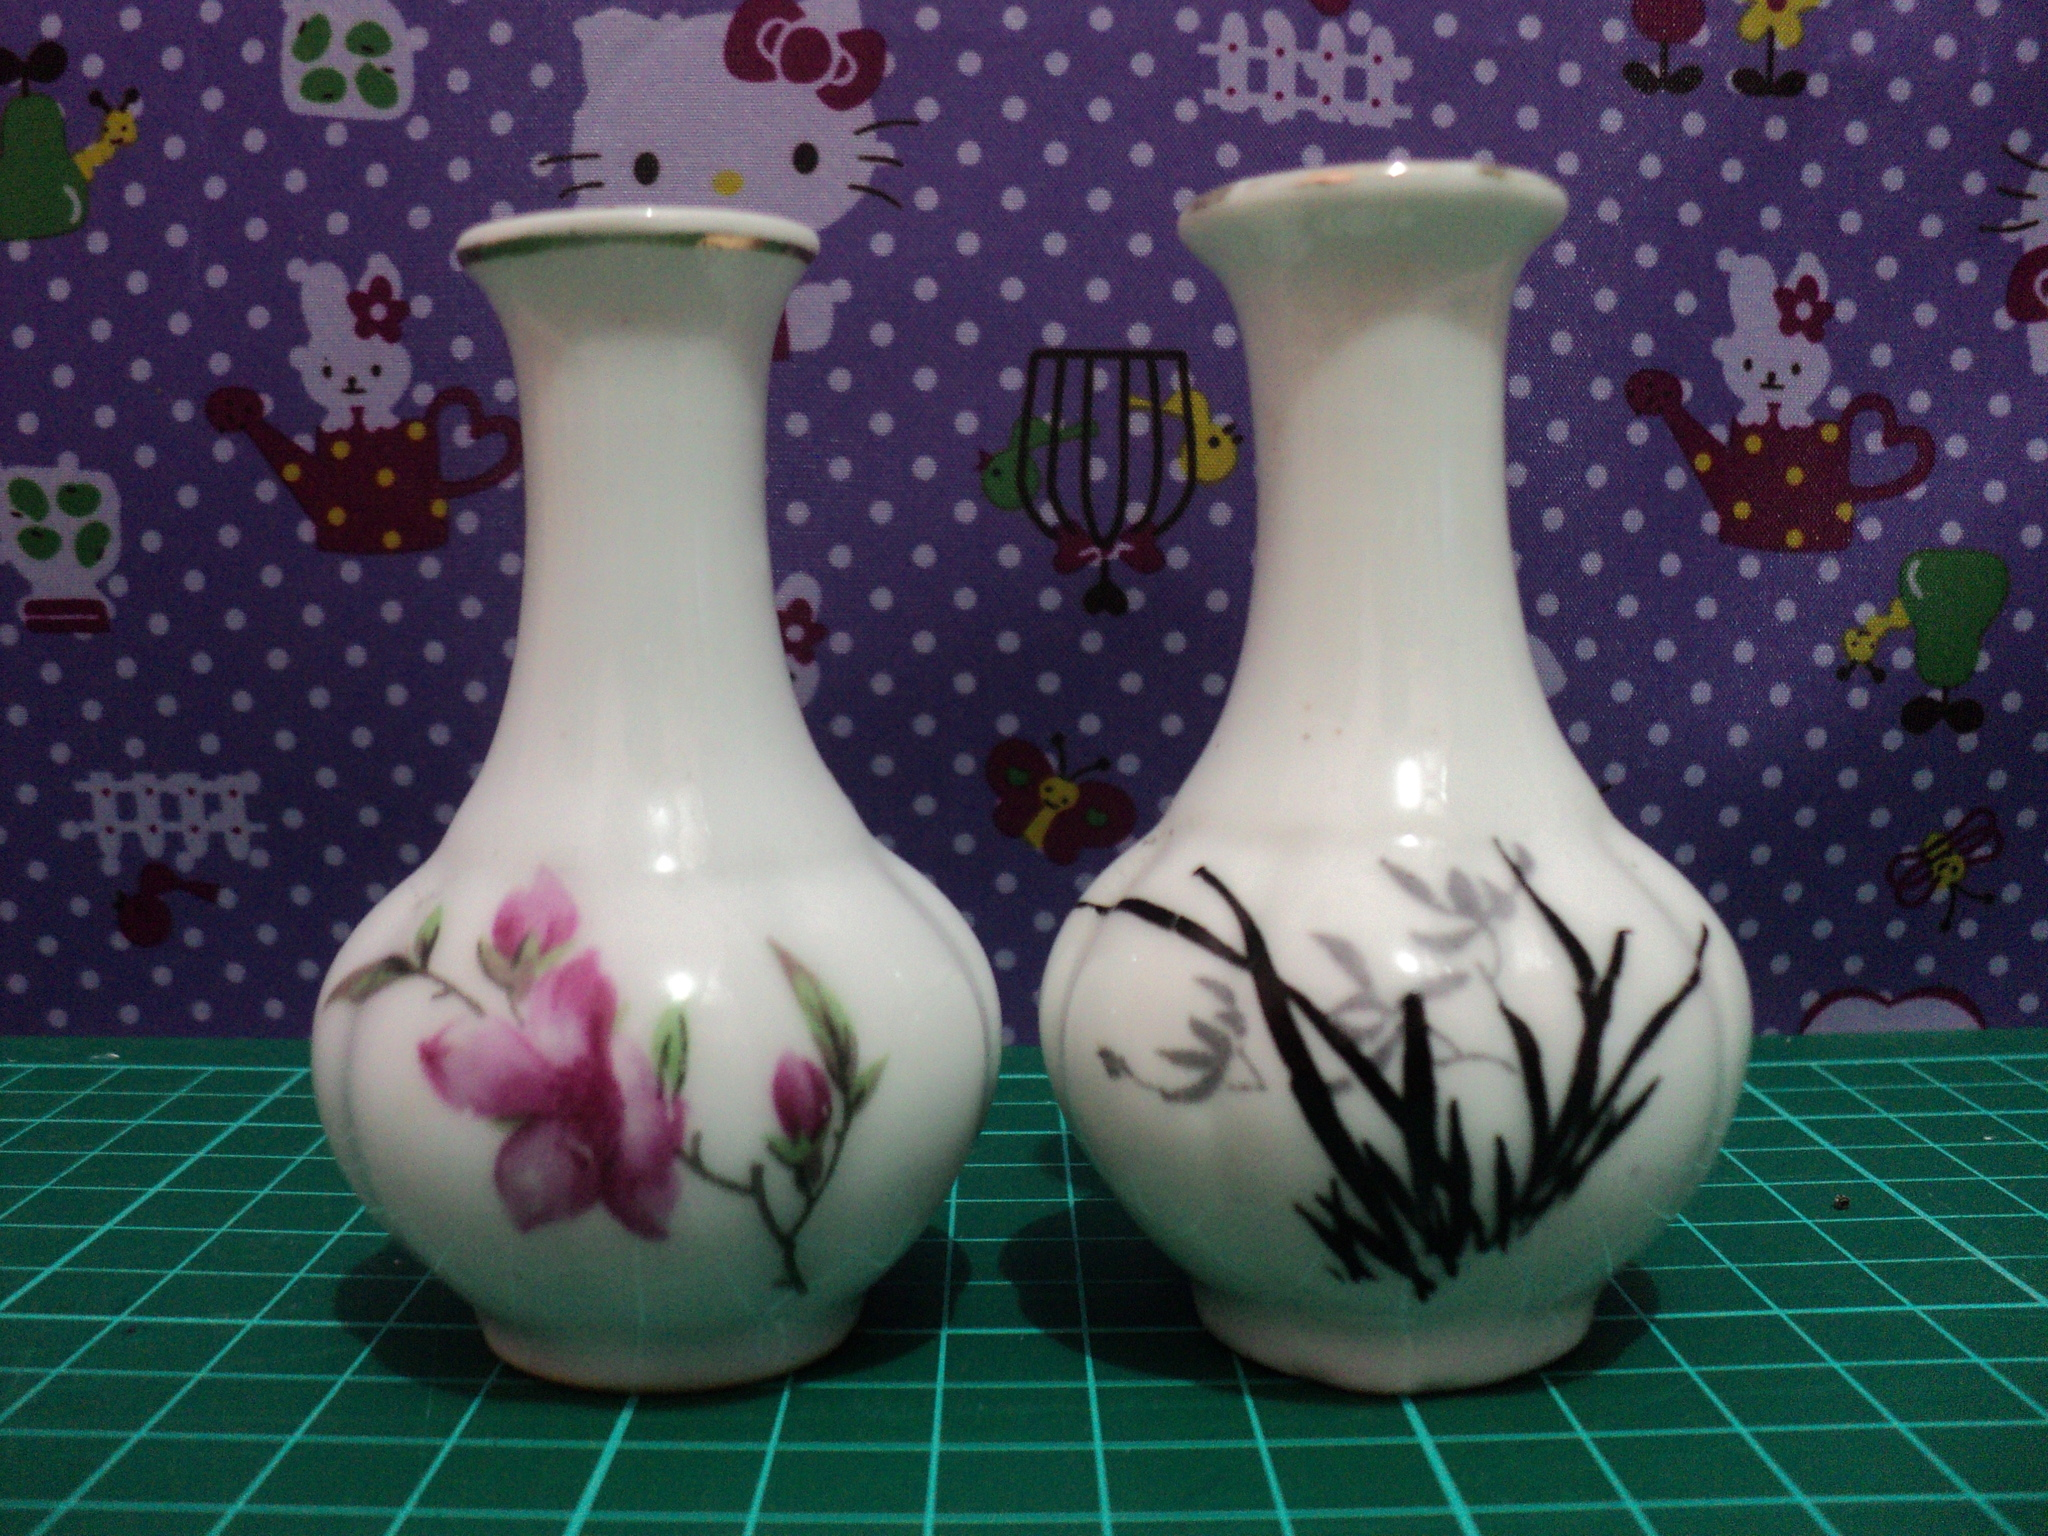 Miniatur Guci China Unik Bahan Keramik Motif Bunga (Set 2pcs)